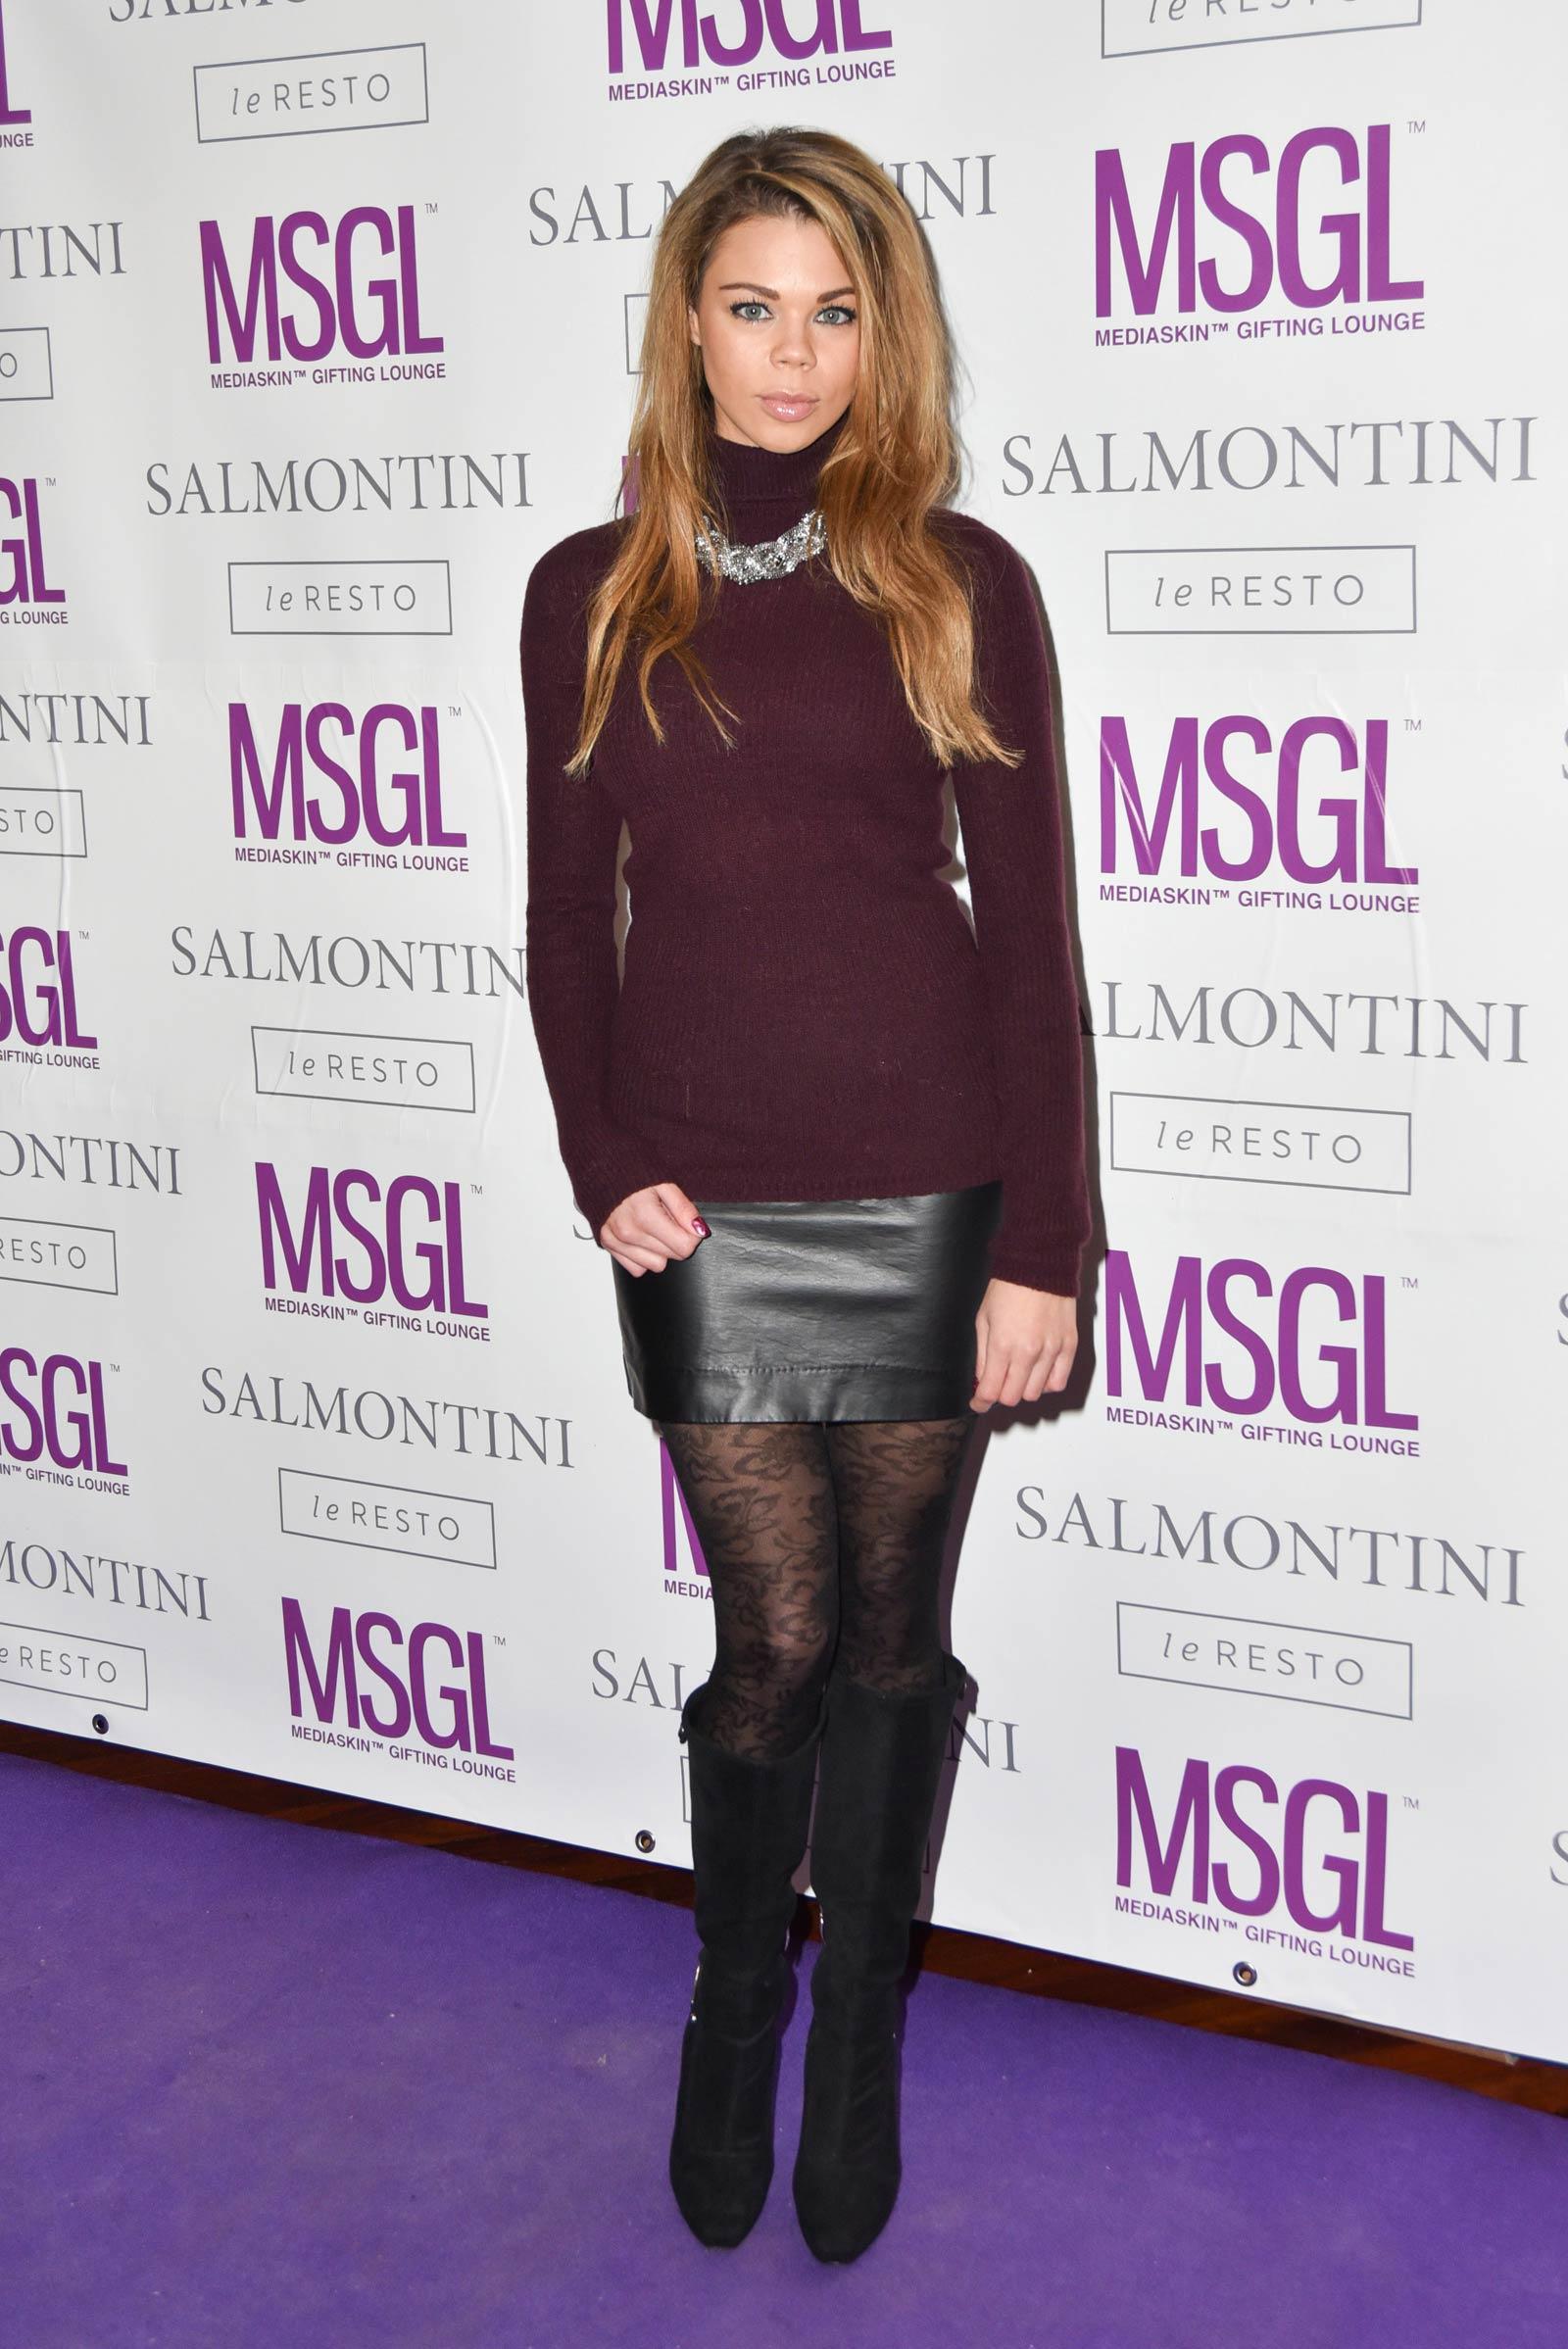 Lauren Riley attends MediaSkin Gifting Lounge